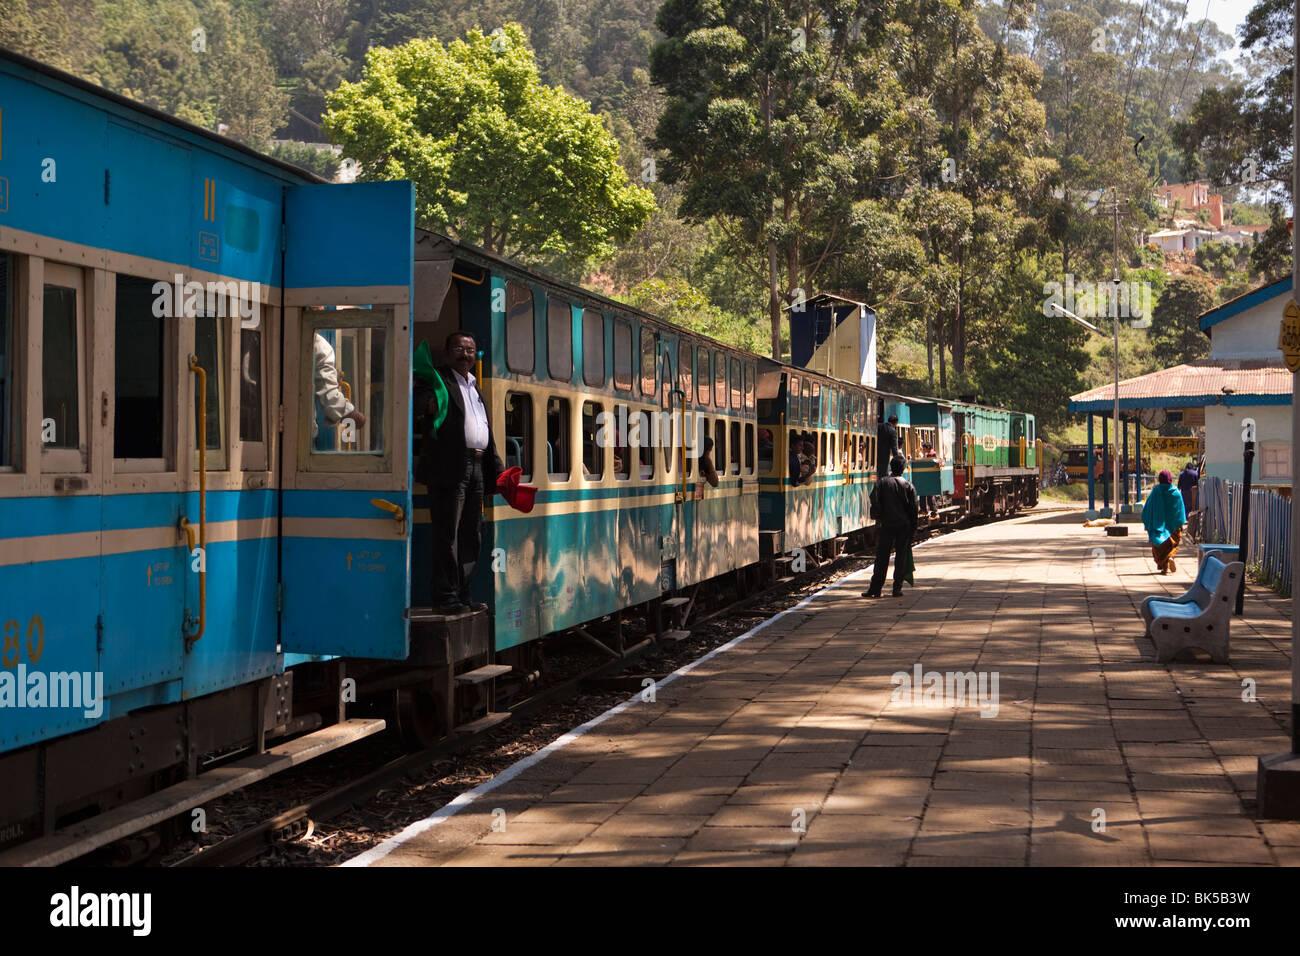 India Tamil Nadu Udhagamandalam Ooty Nilgiri Mountain Railway Rack Train At Station Platform